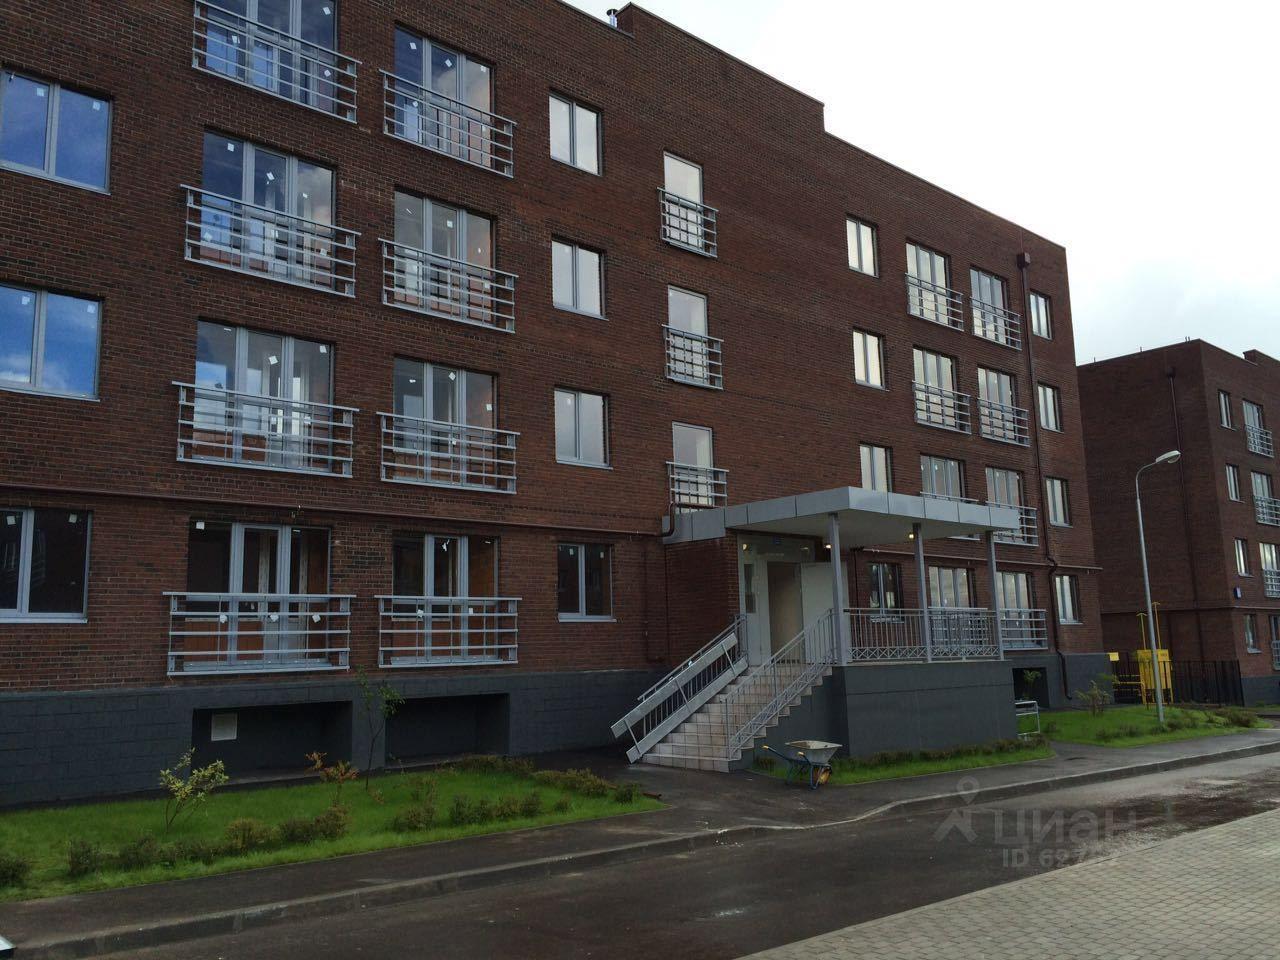 продается однокомнатная квартира Красногорский район, деревня Сабурово